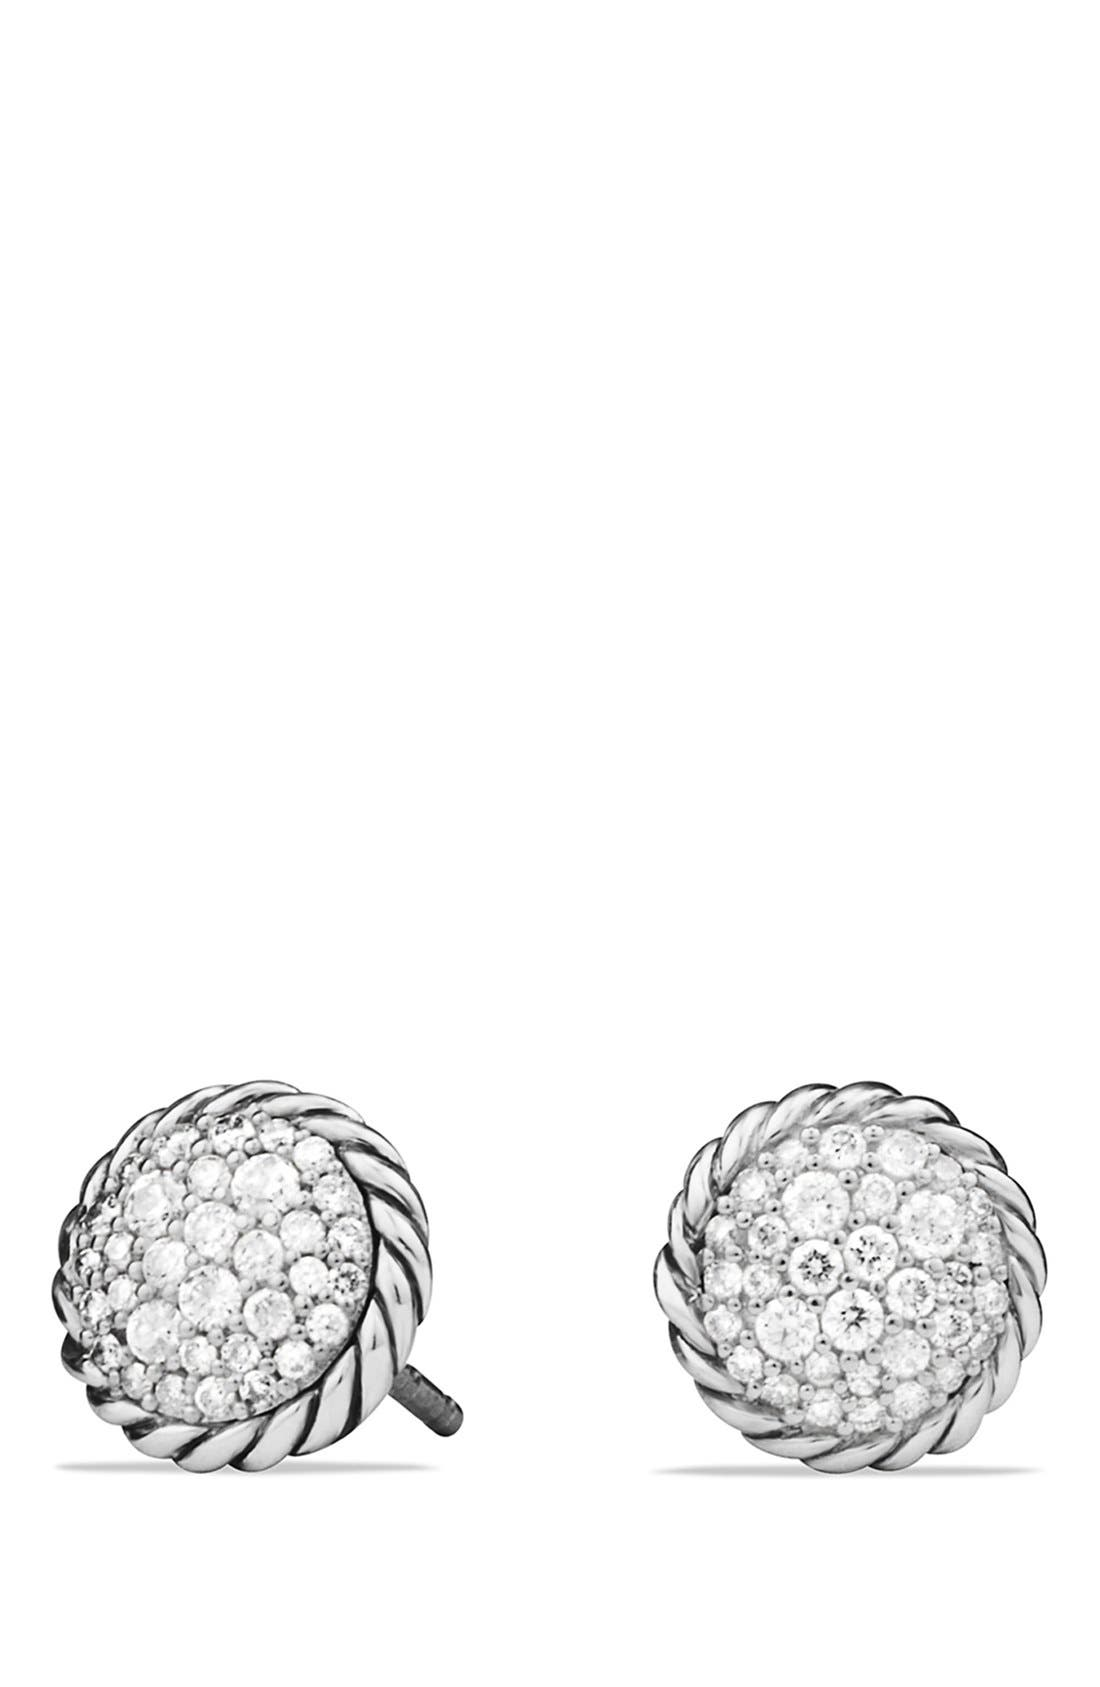 Main Image - David Yurman 'Châtelaine' Pavé Earring with Diamonds